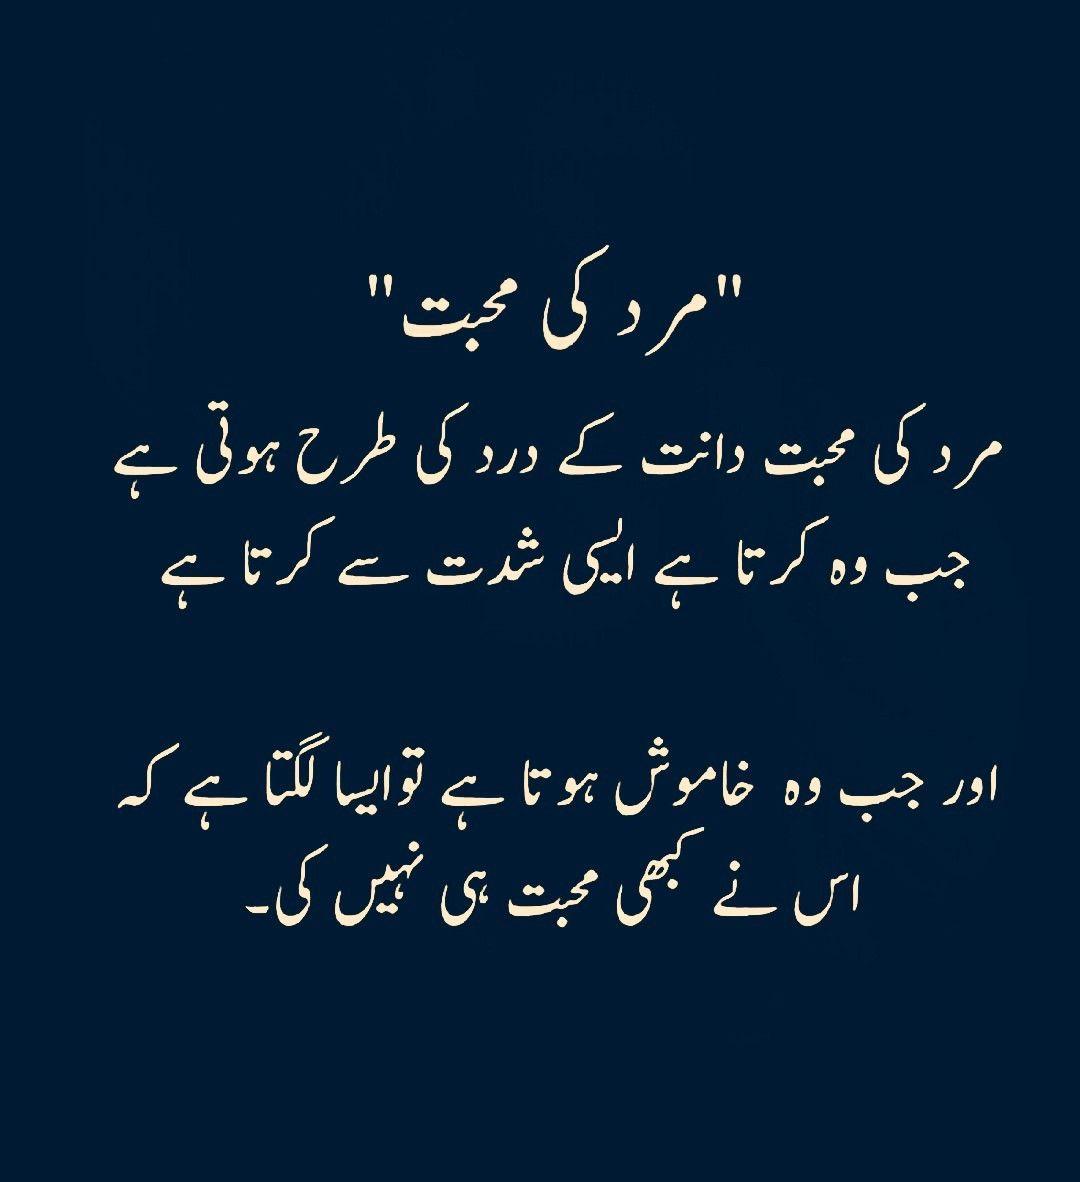 Mard ki Mohabbat.. | Poetry pic, Bano qudsia quotes, Love ...